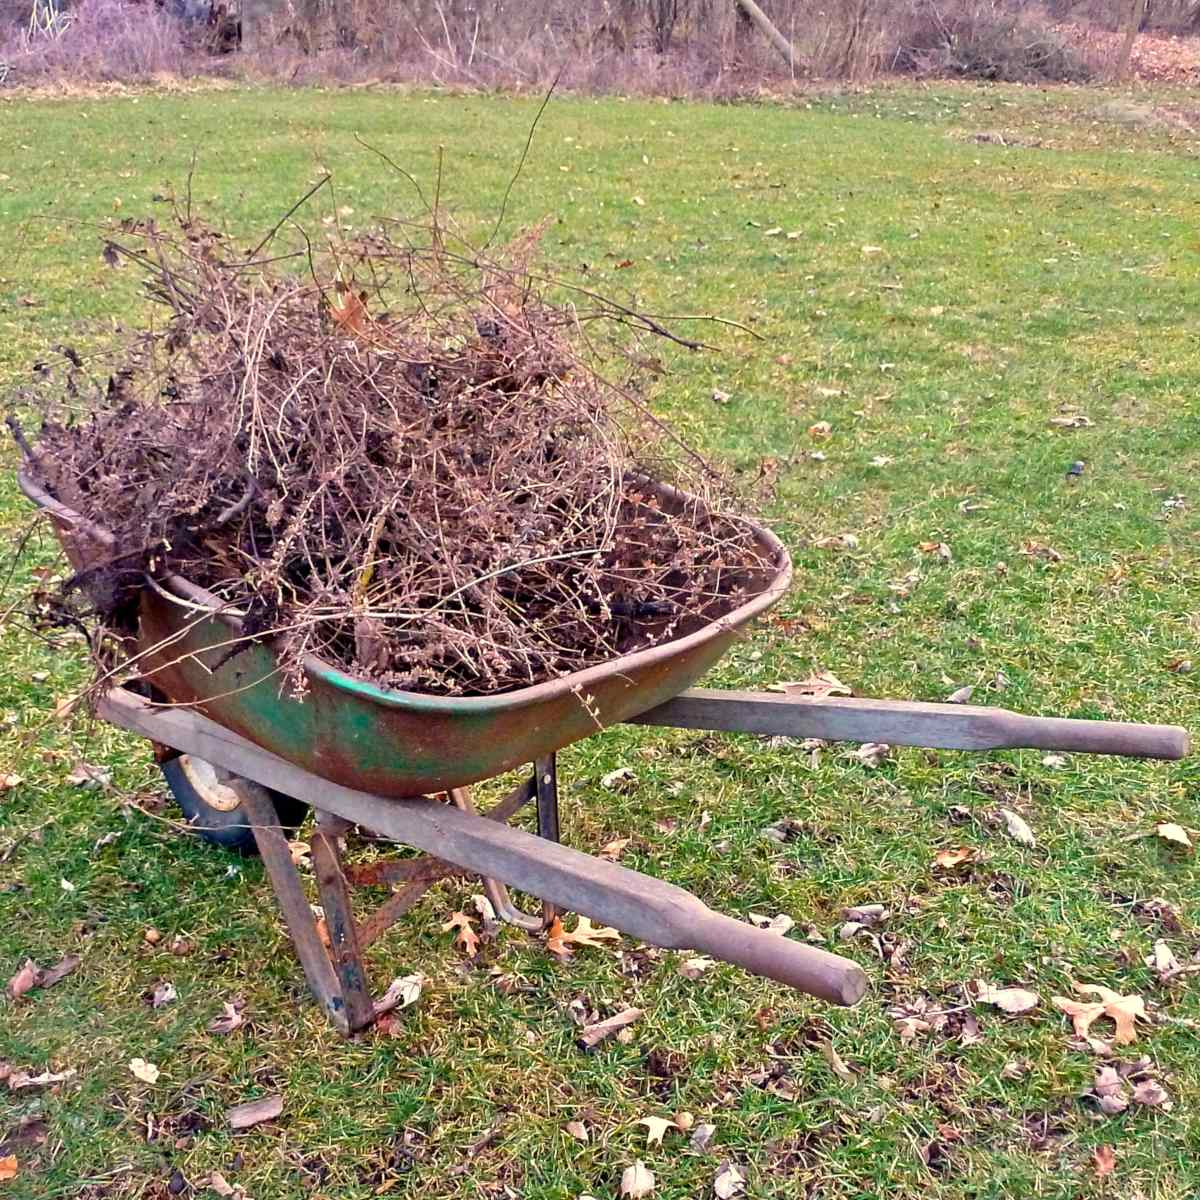 A wheelbarrow with dead branches inside.